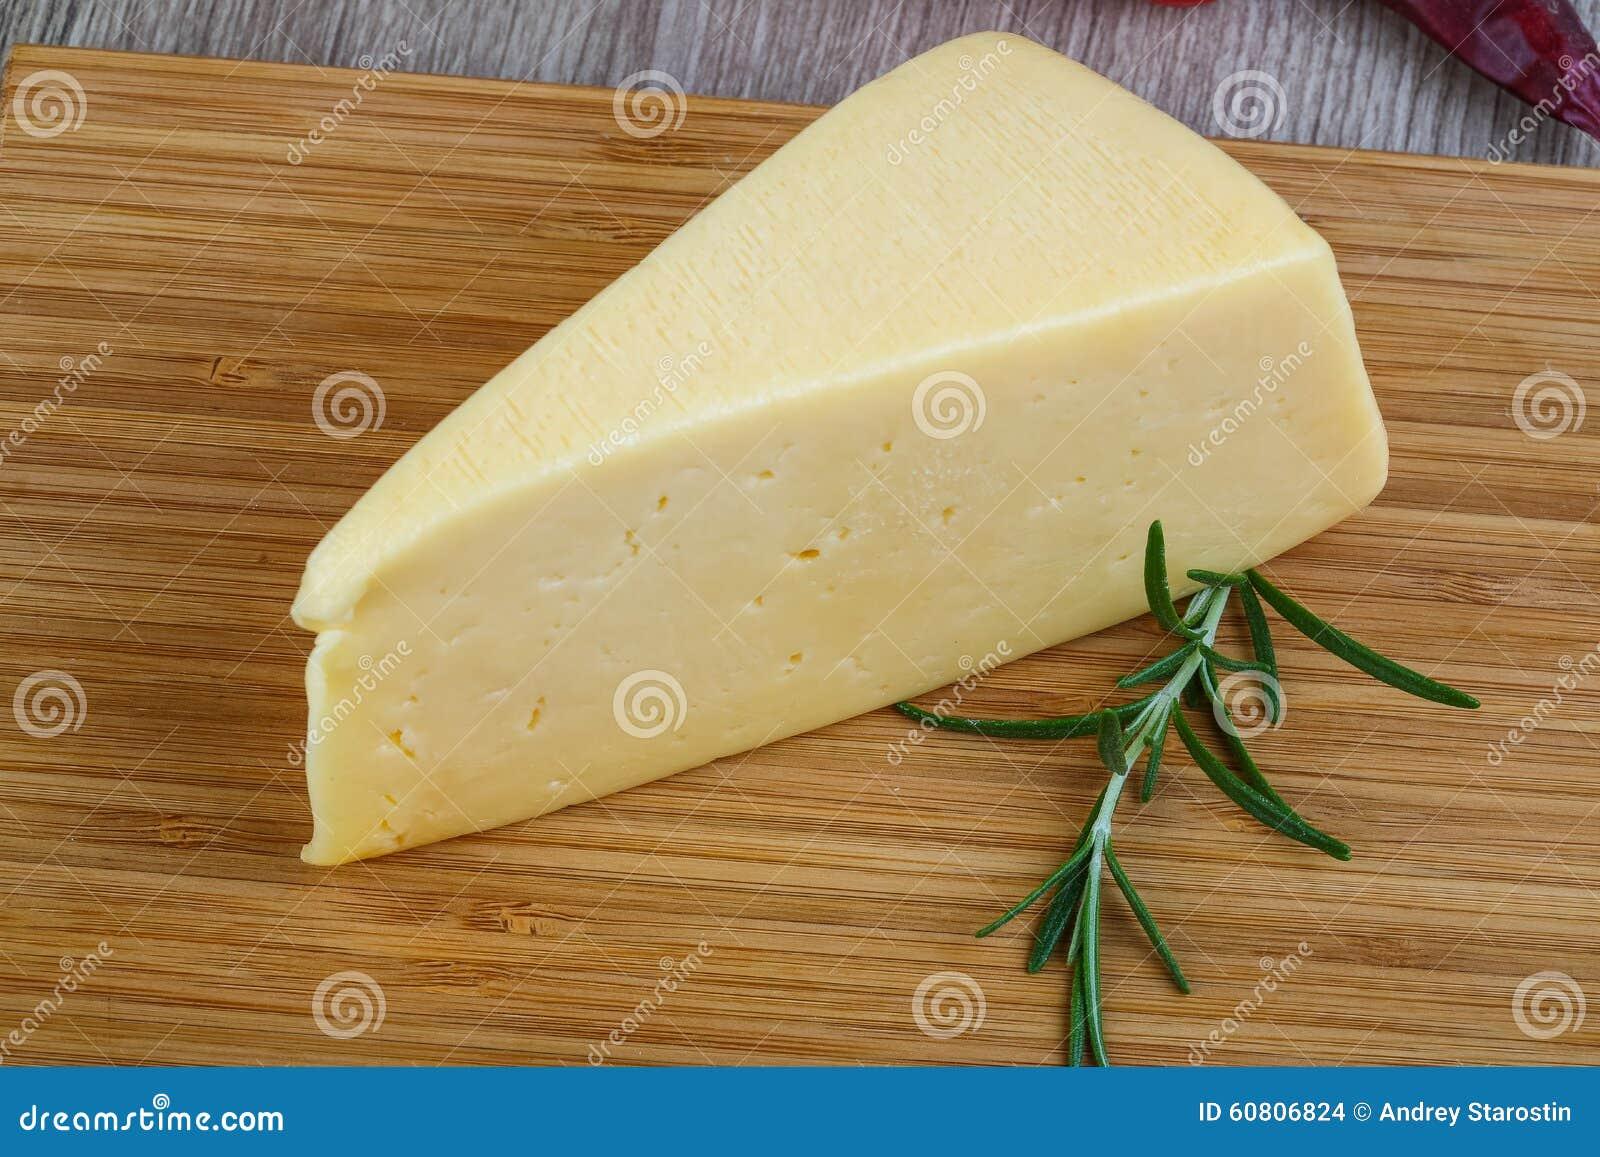 yellow-cheese-triangle-rosemary-herbs-wo